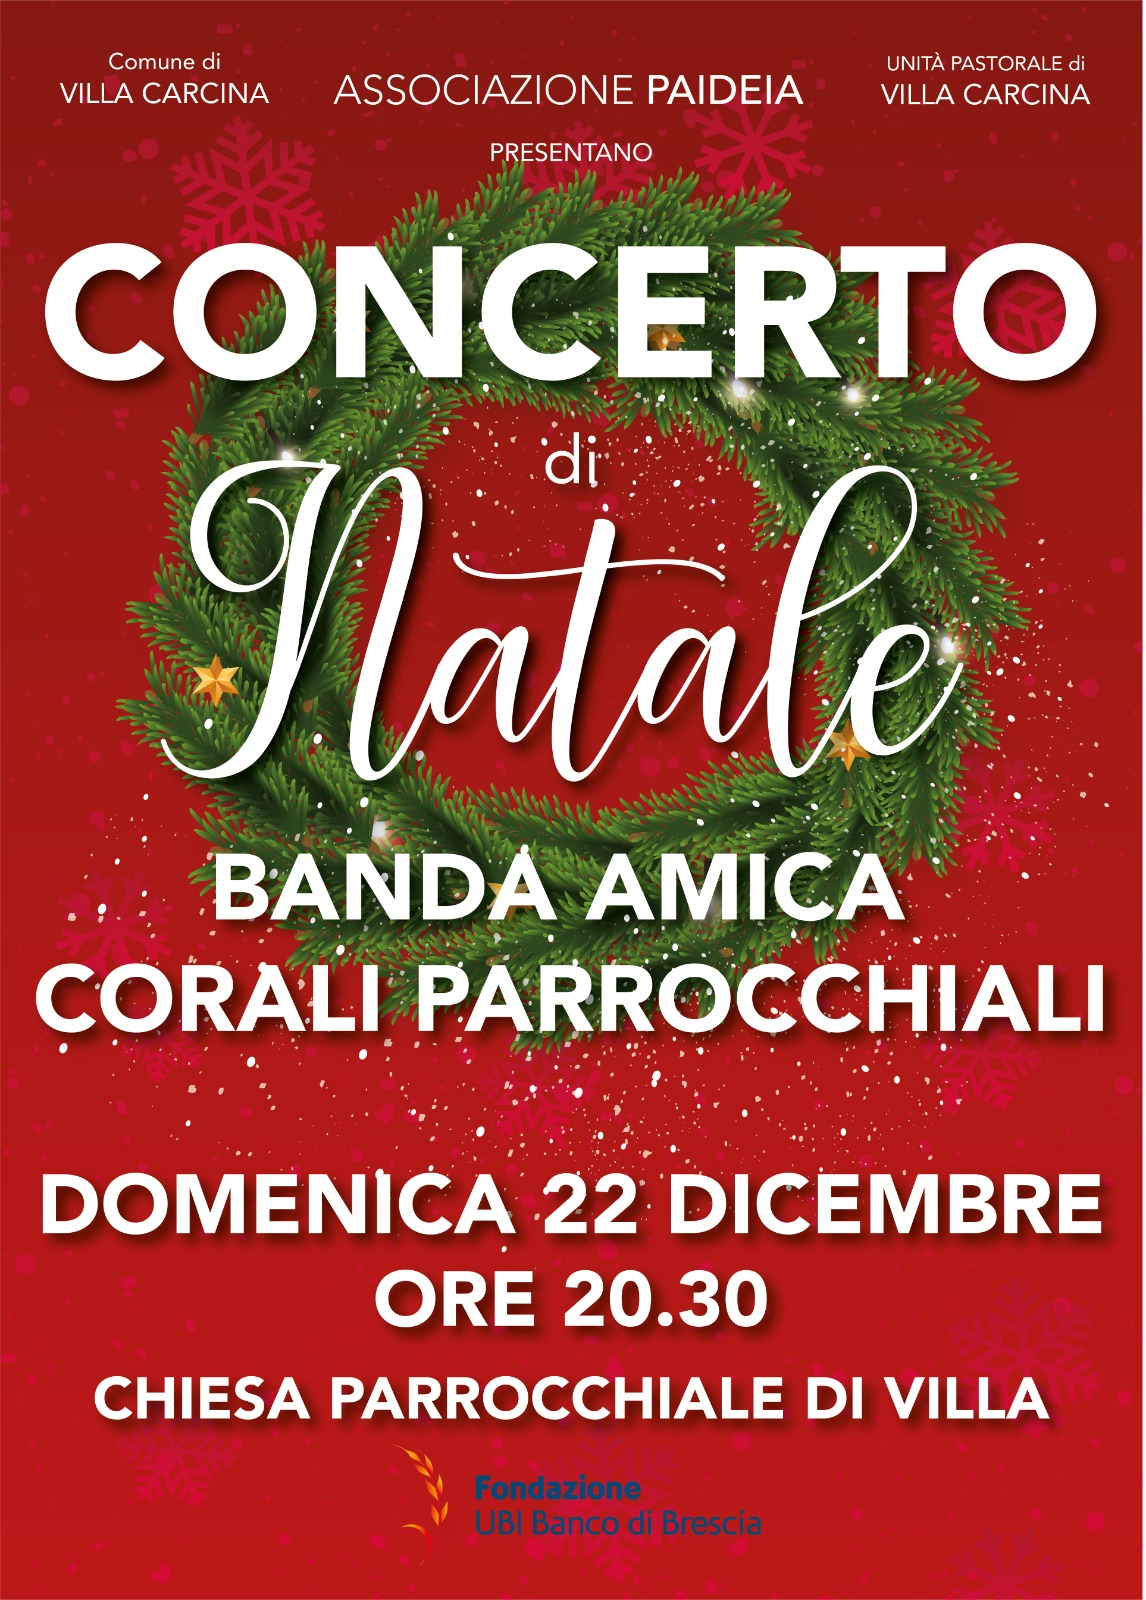 Concerto 02